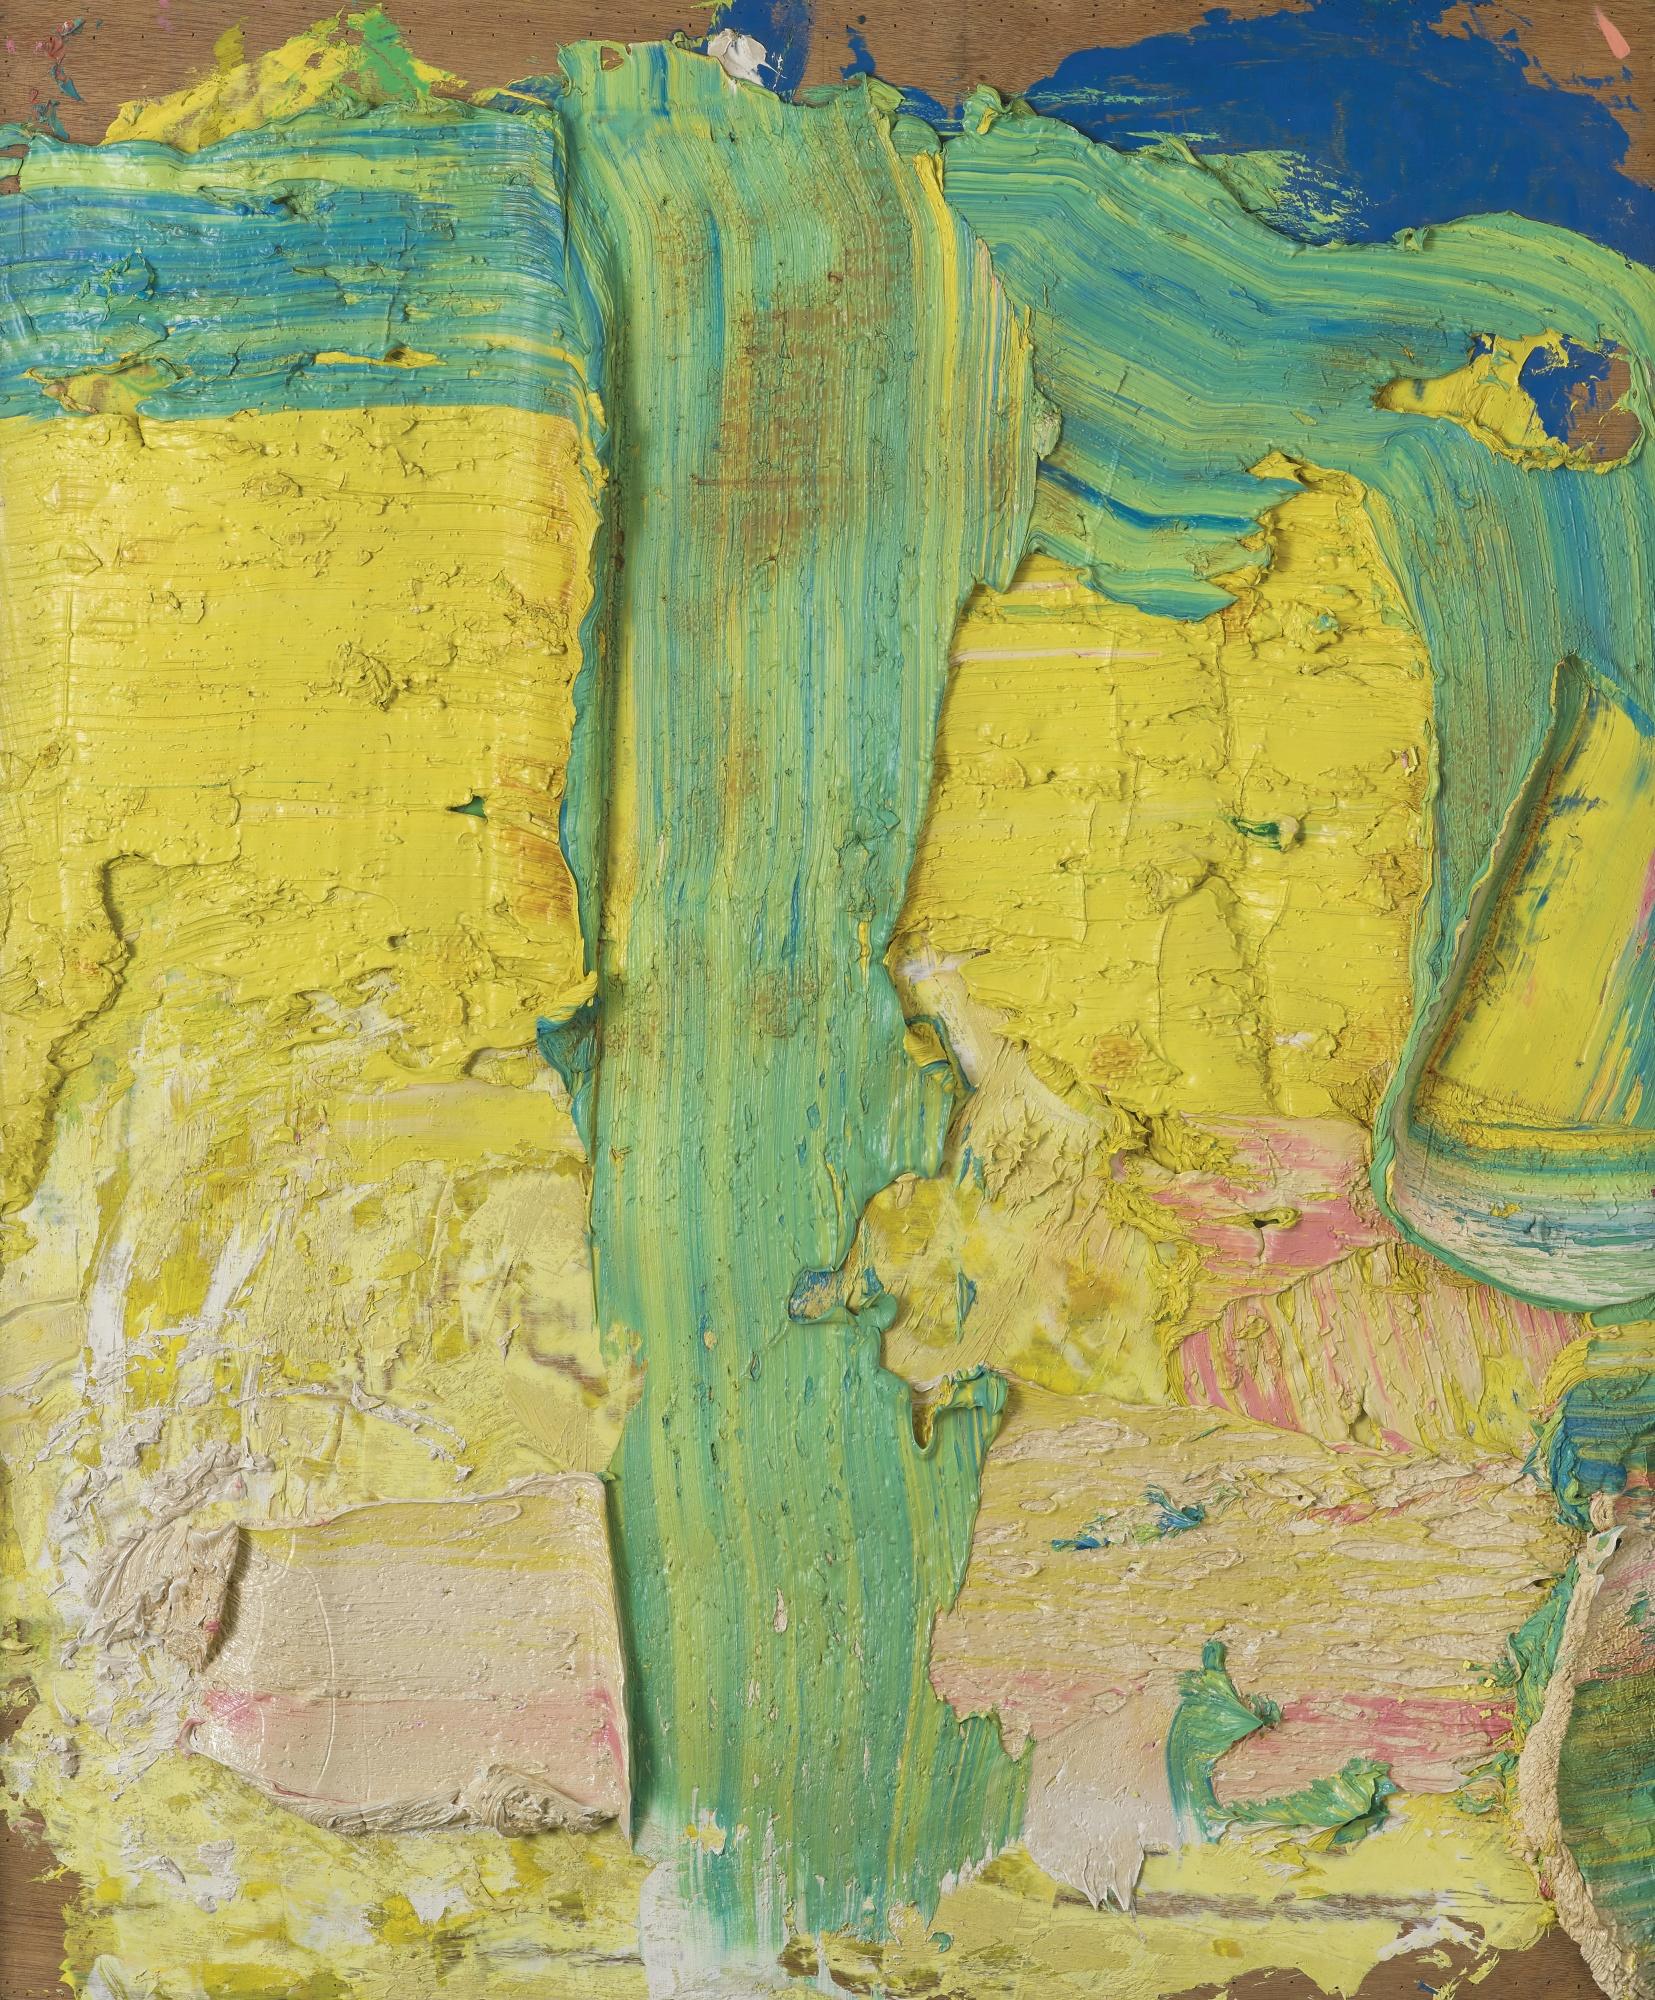 Zhu Jinshi-Thick Strokes No. 4-2008